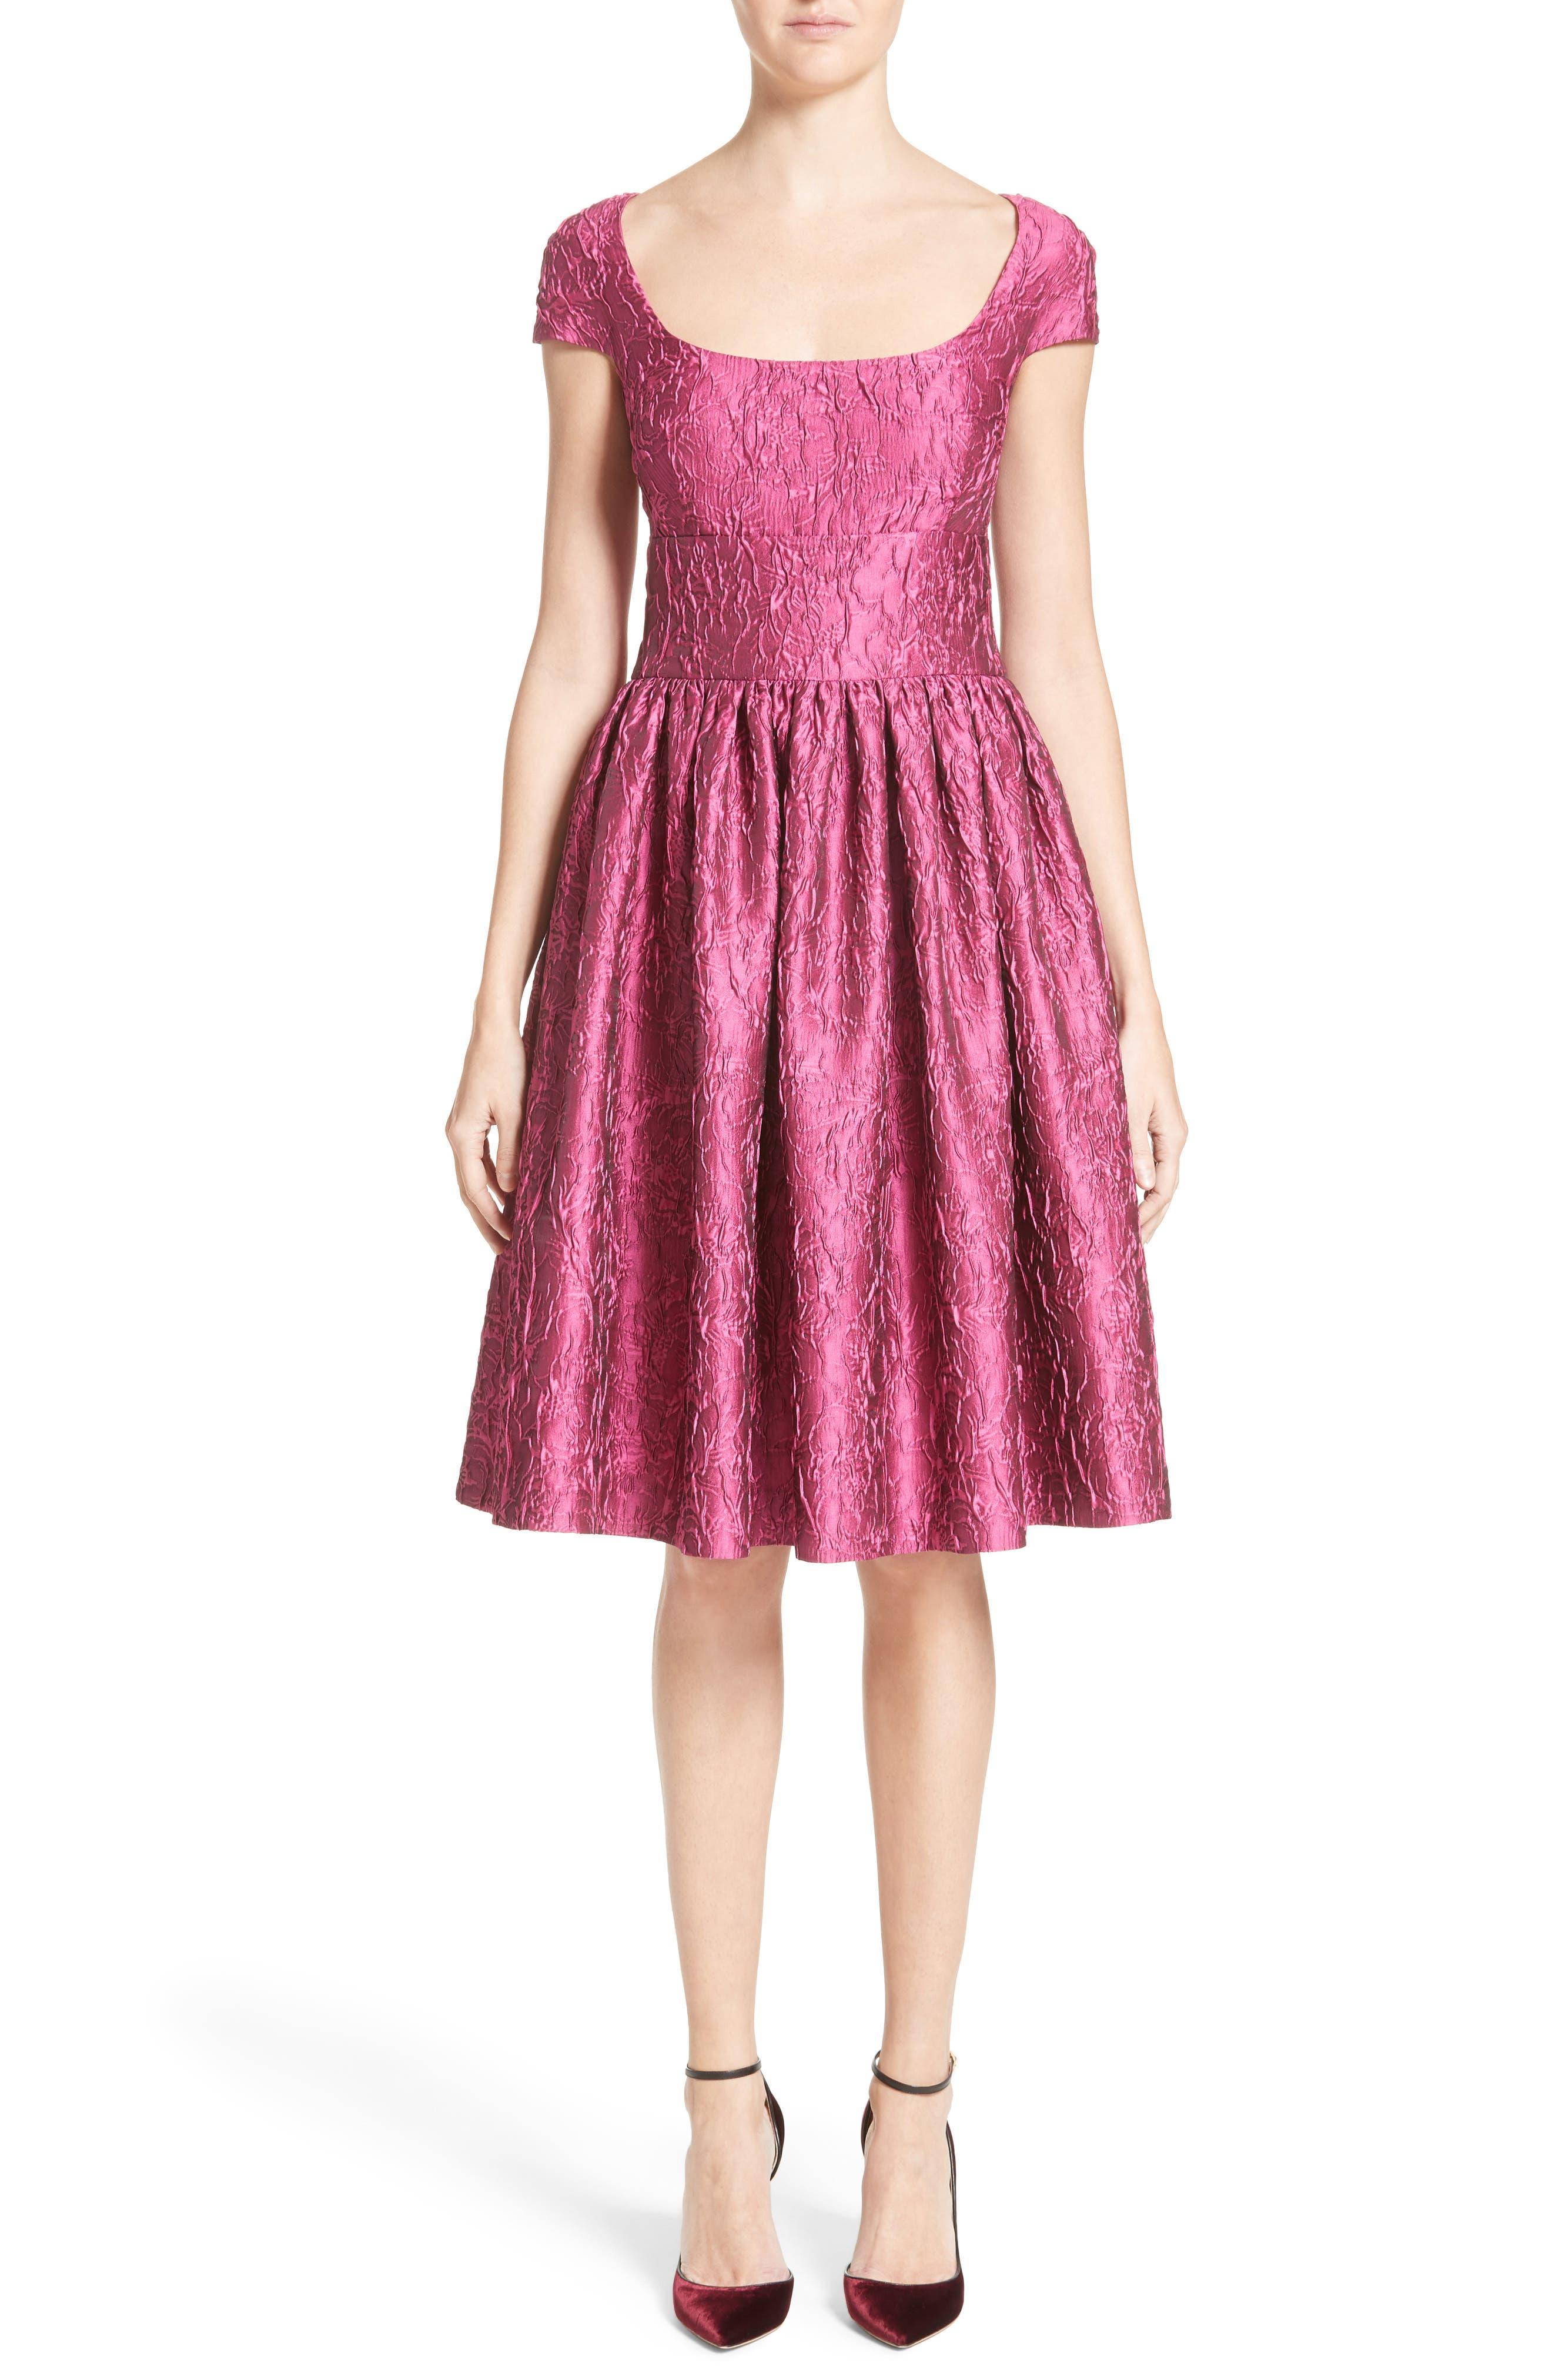 Main Image - Badgley Mischka Couture Cap Sleeve Brocade Party Dress (Nordstrom Exclusive)